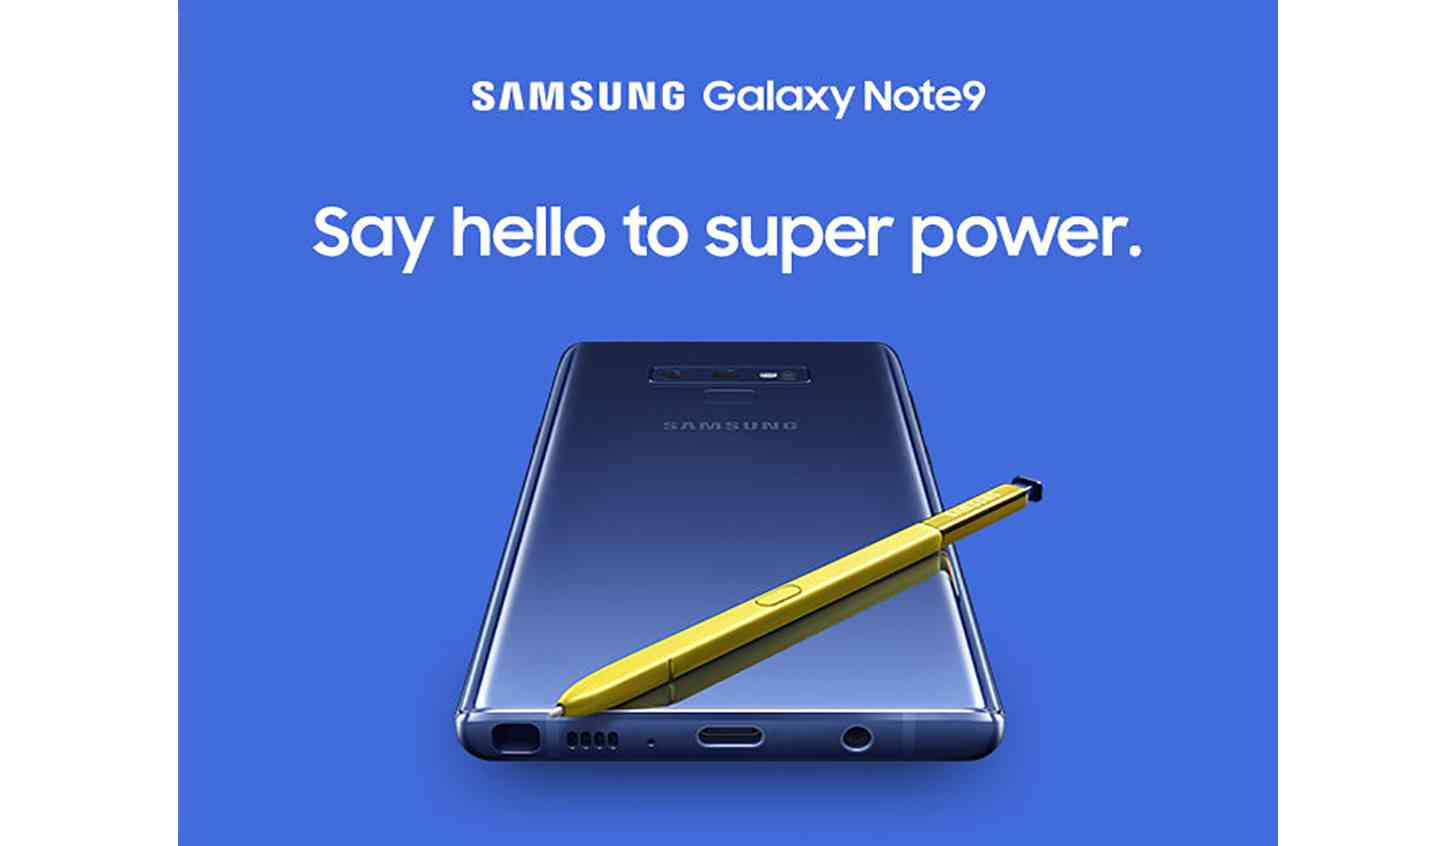 Samsung Galaxy Note 9 web page leak